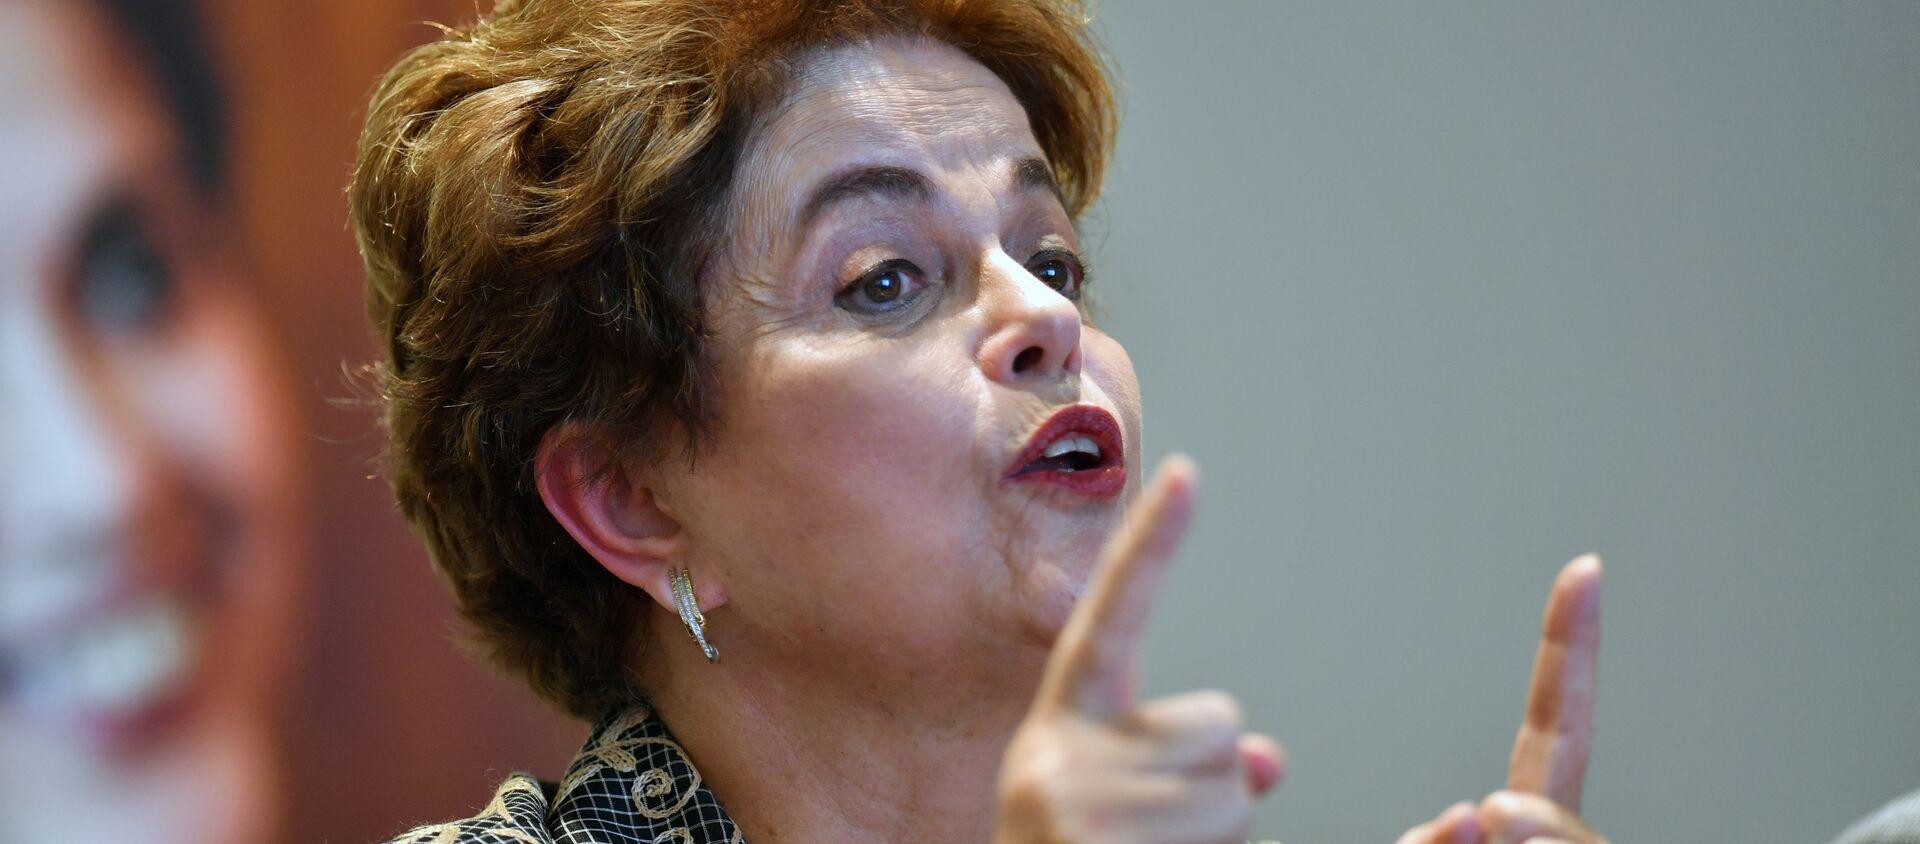 Dilma Rousseff, expresidenta de Brasil - Sputnik Mundo, 1920, 29.01.2021